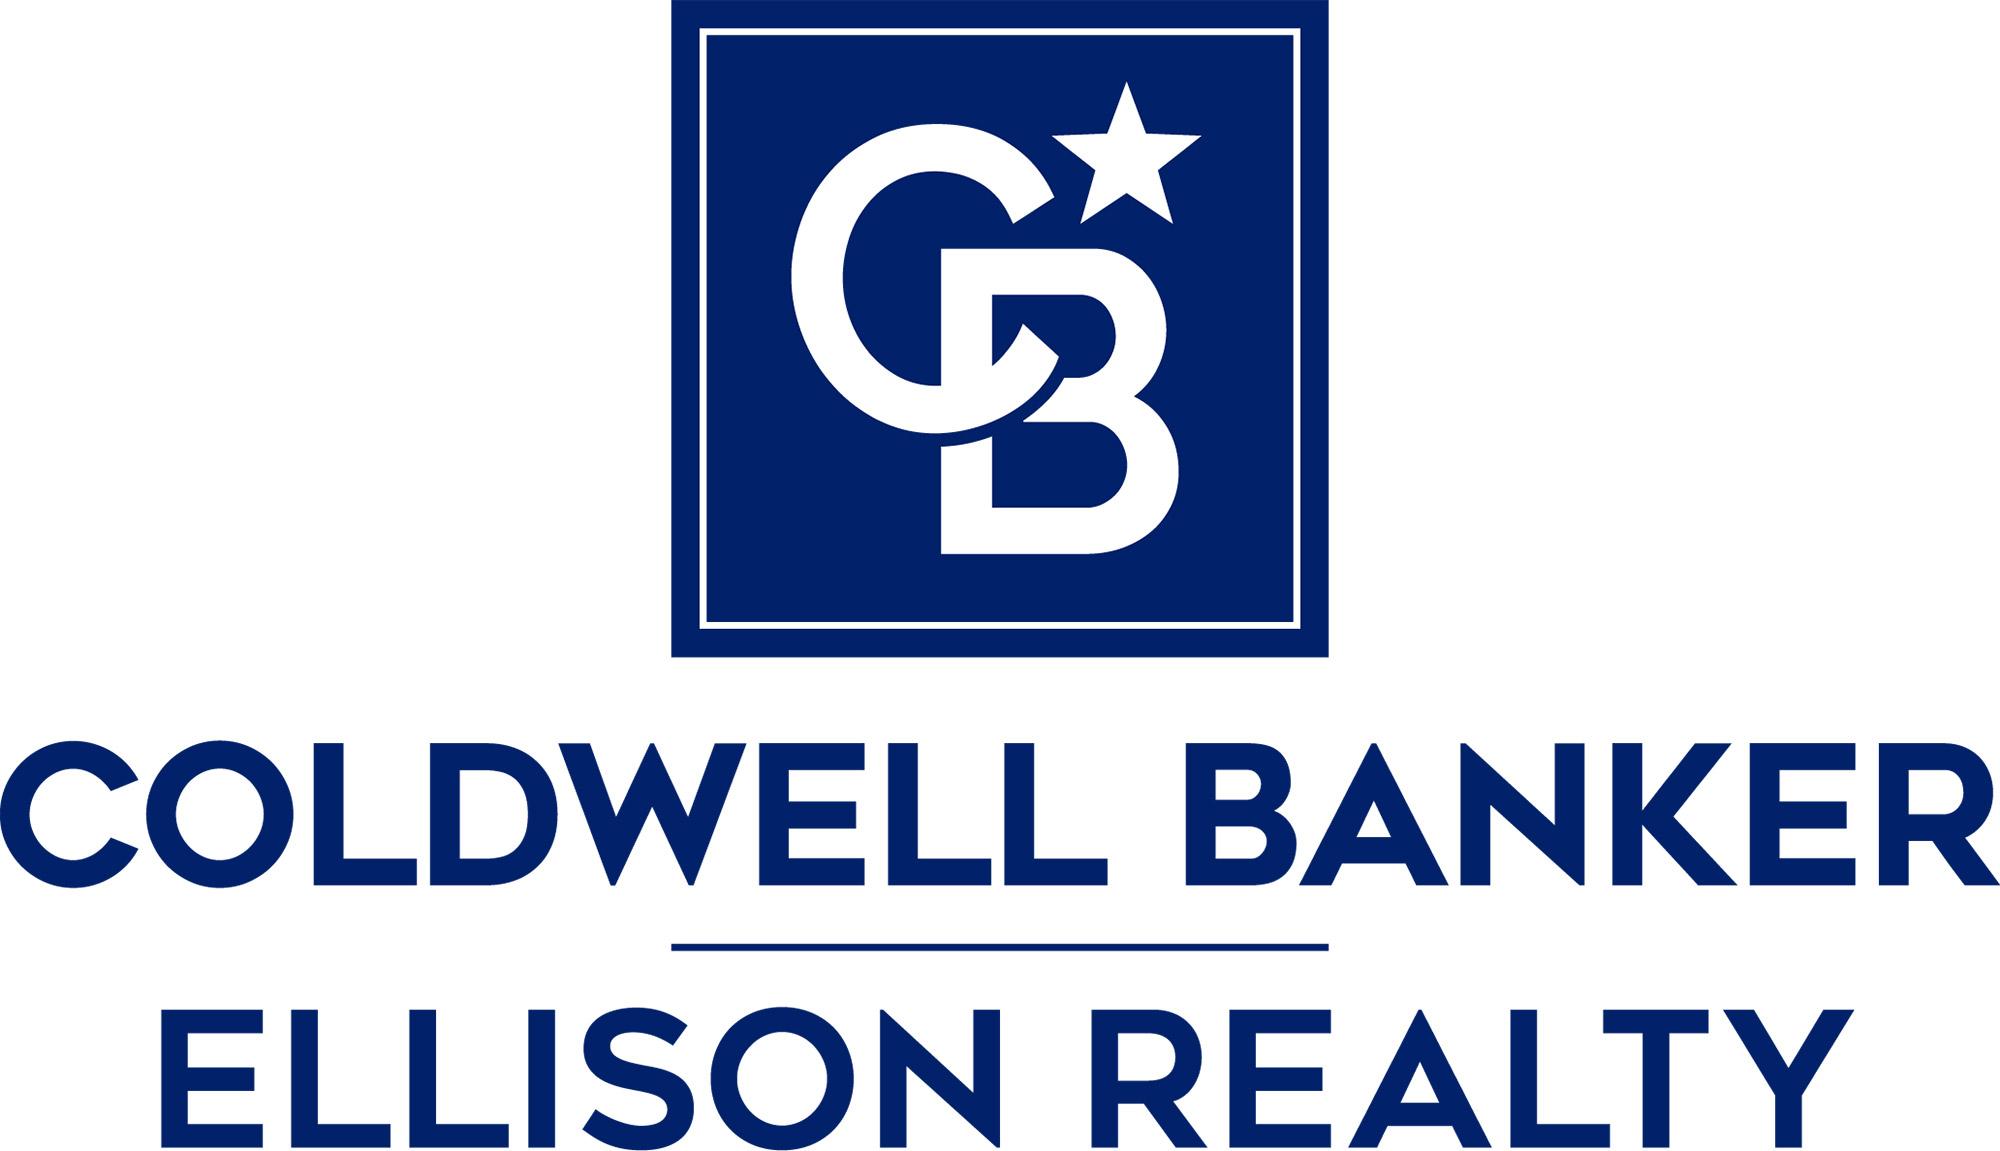 Carol Smith - Coldwell Banker Ellison Realty Logo